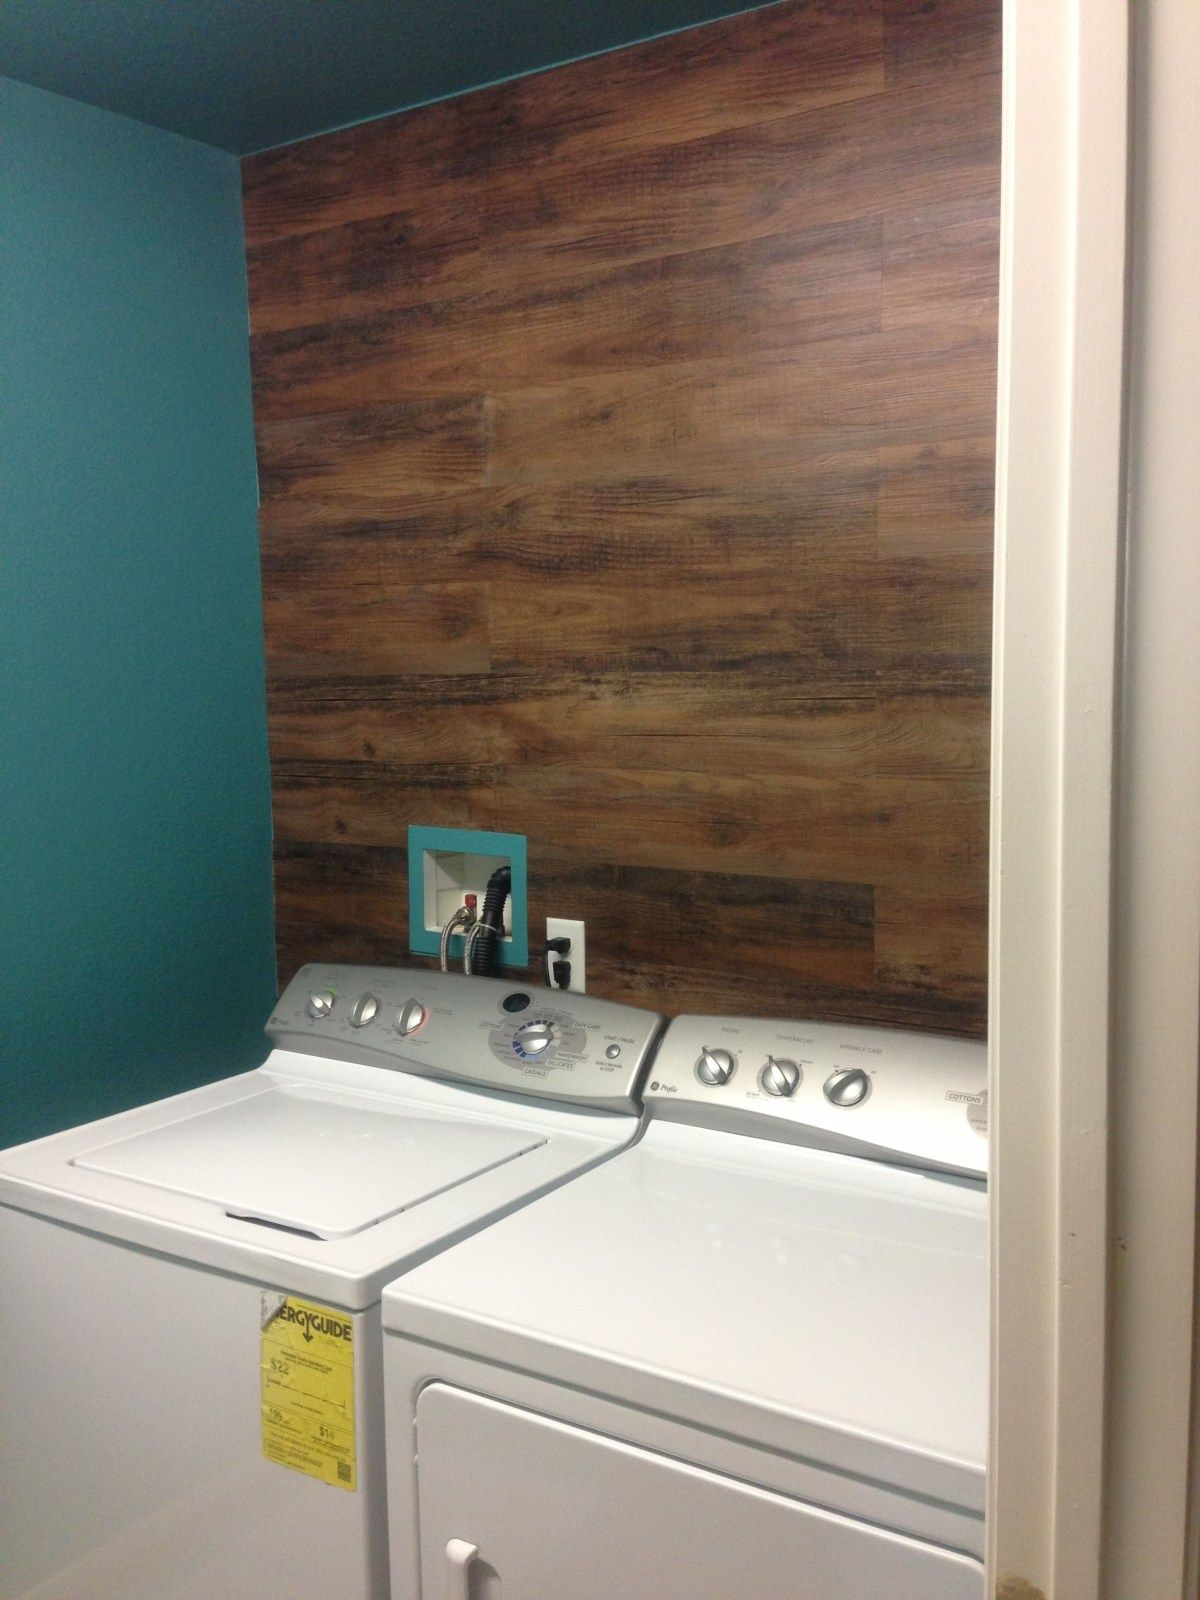 Vinyl Wall Covering For Bathrooms Vinyl Flooring Bathroom Vinyl Flooring On Walls